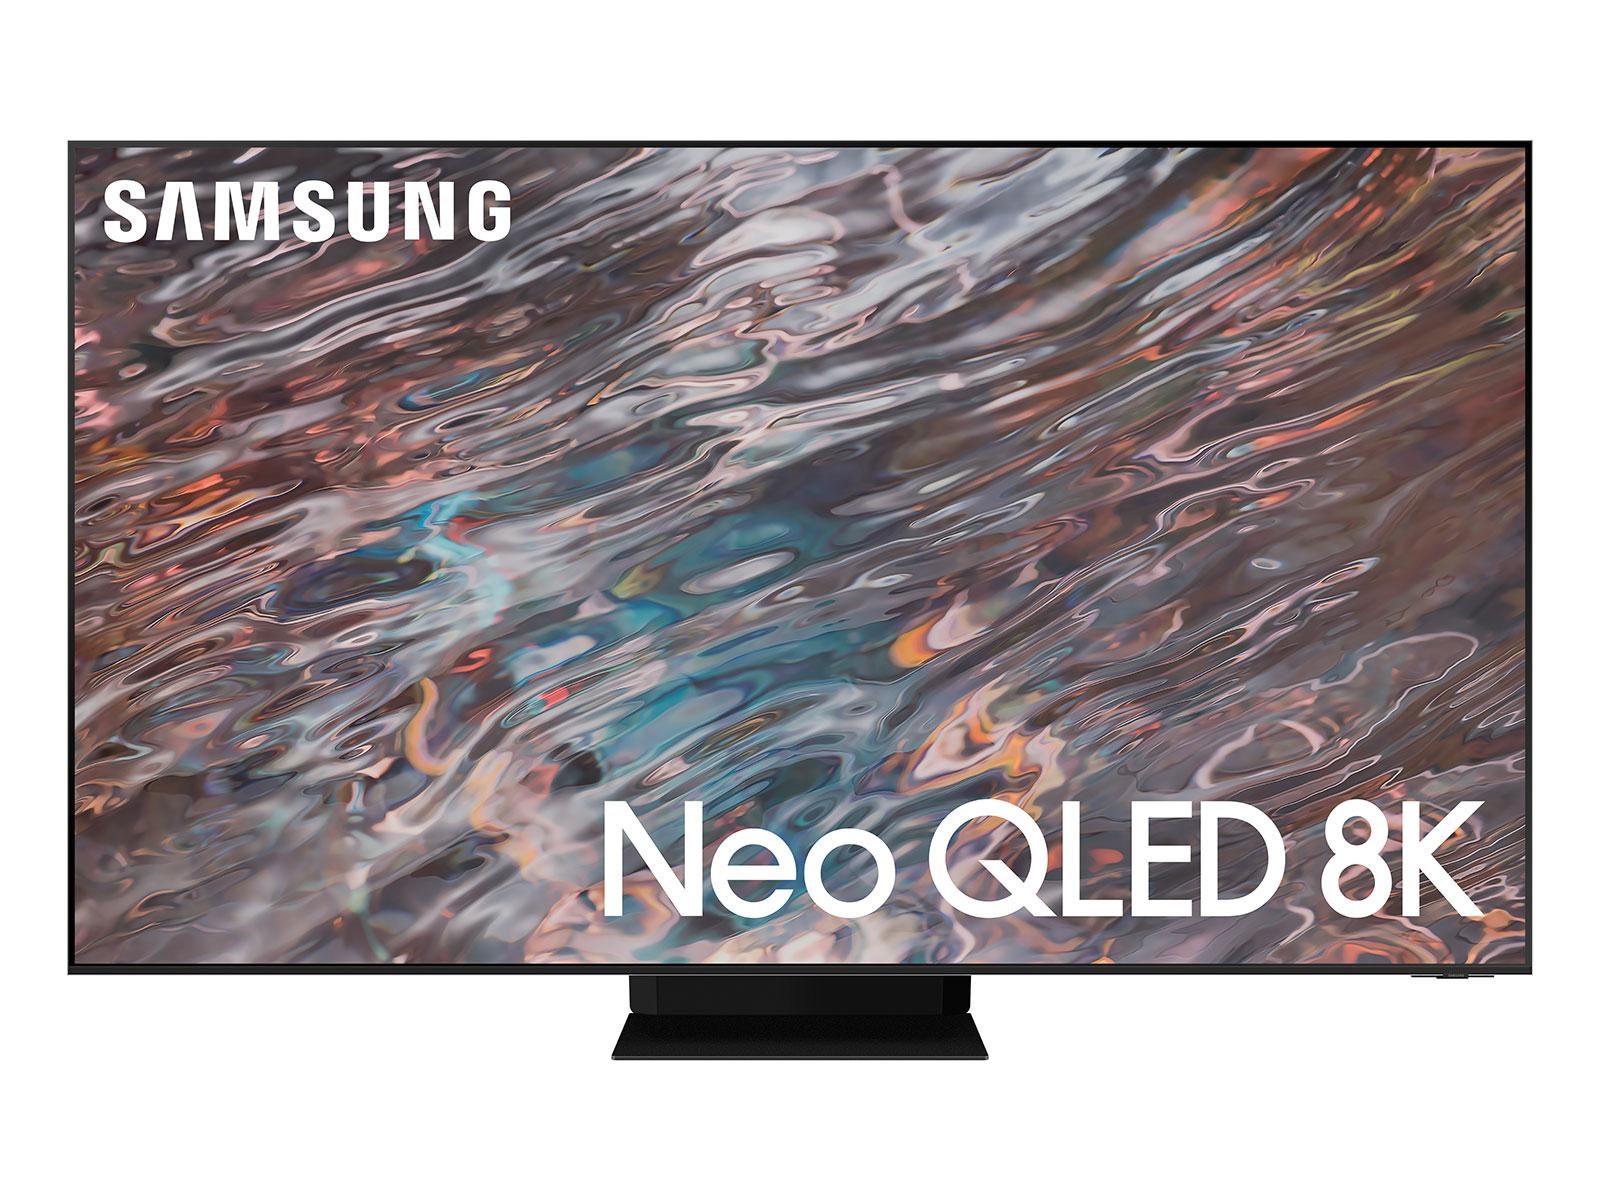 Samsung 85 QN800A Neo QLED 8K Smart TV, QN85QN800AFXZA, 2021